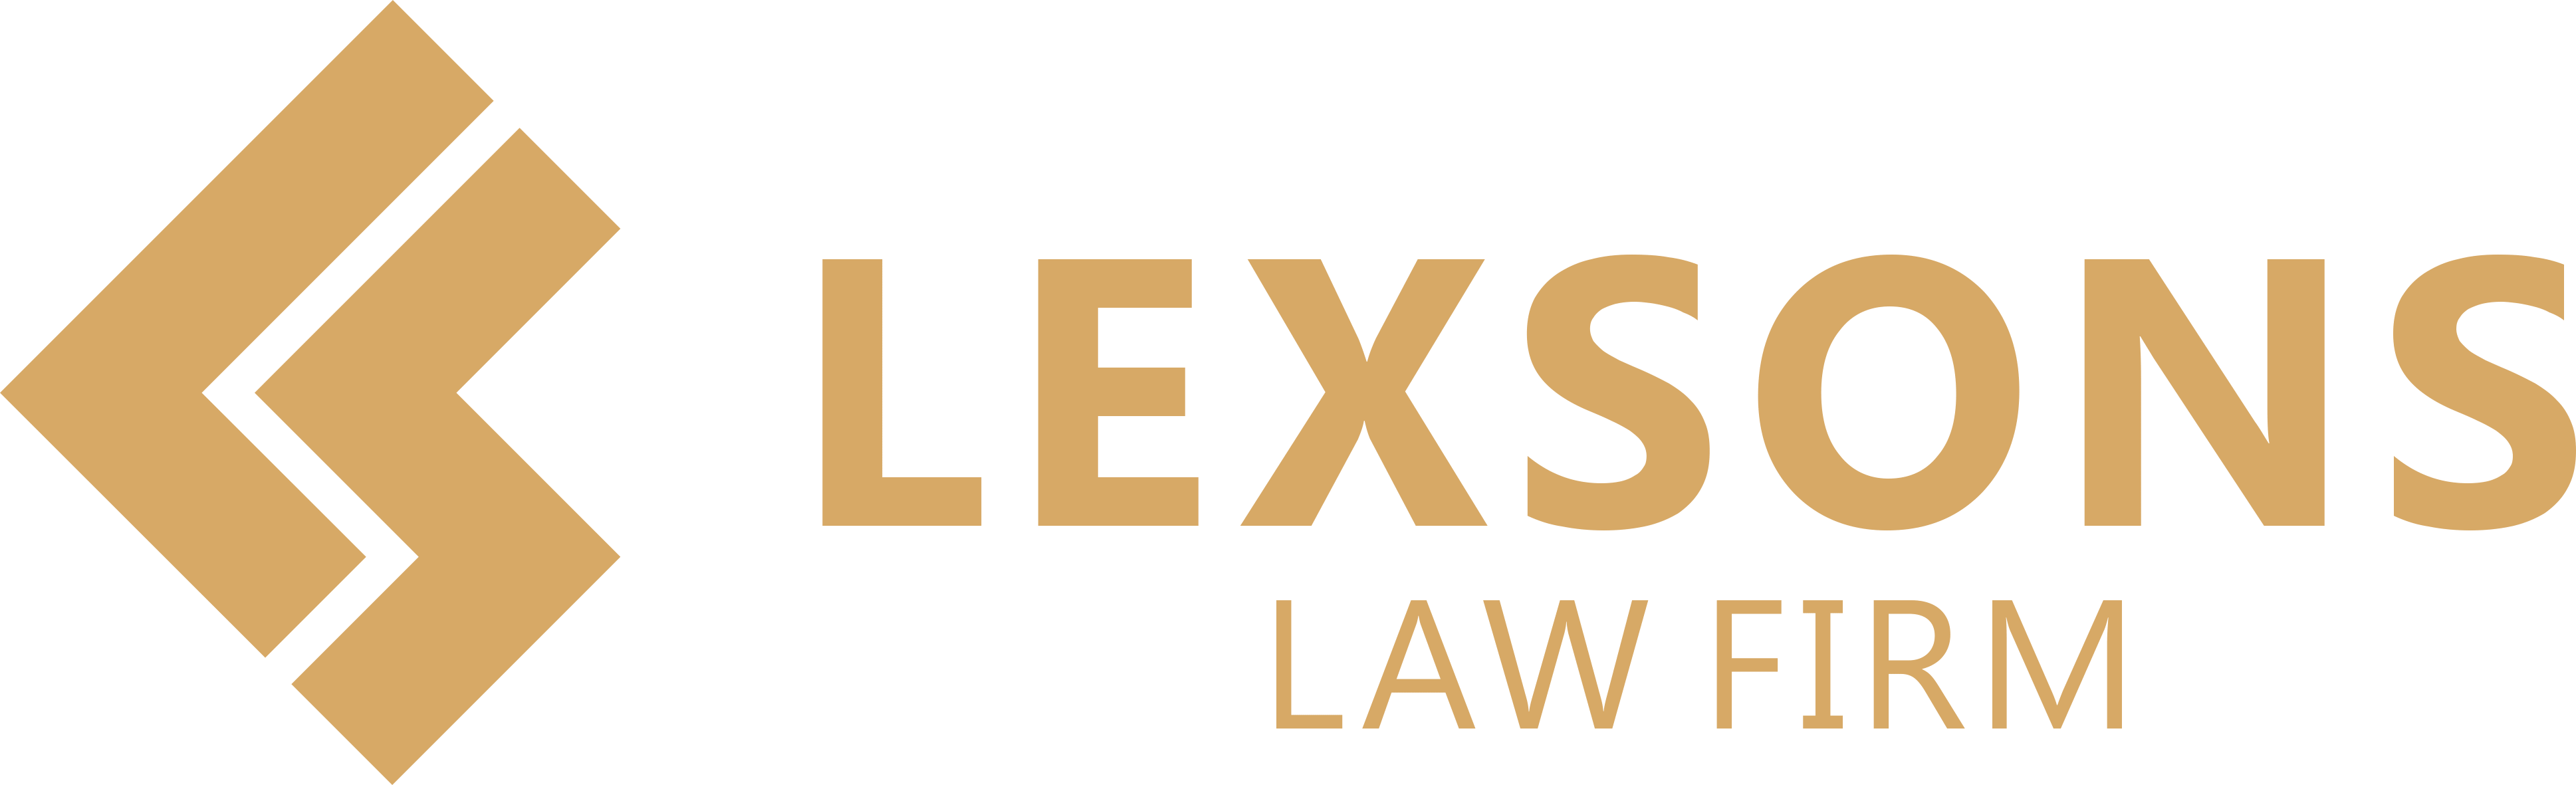 Lexsons Law Firm